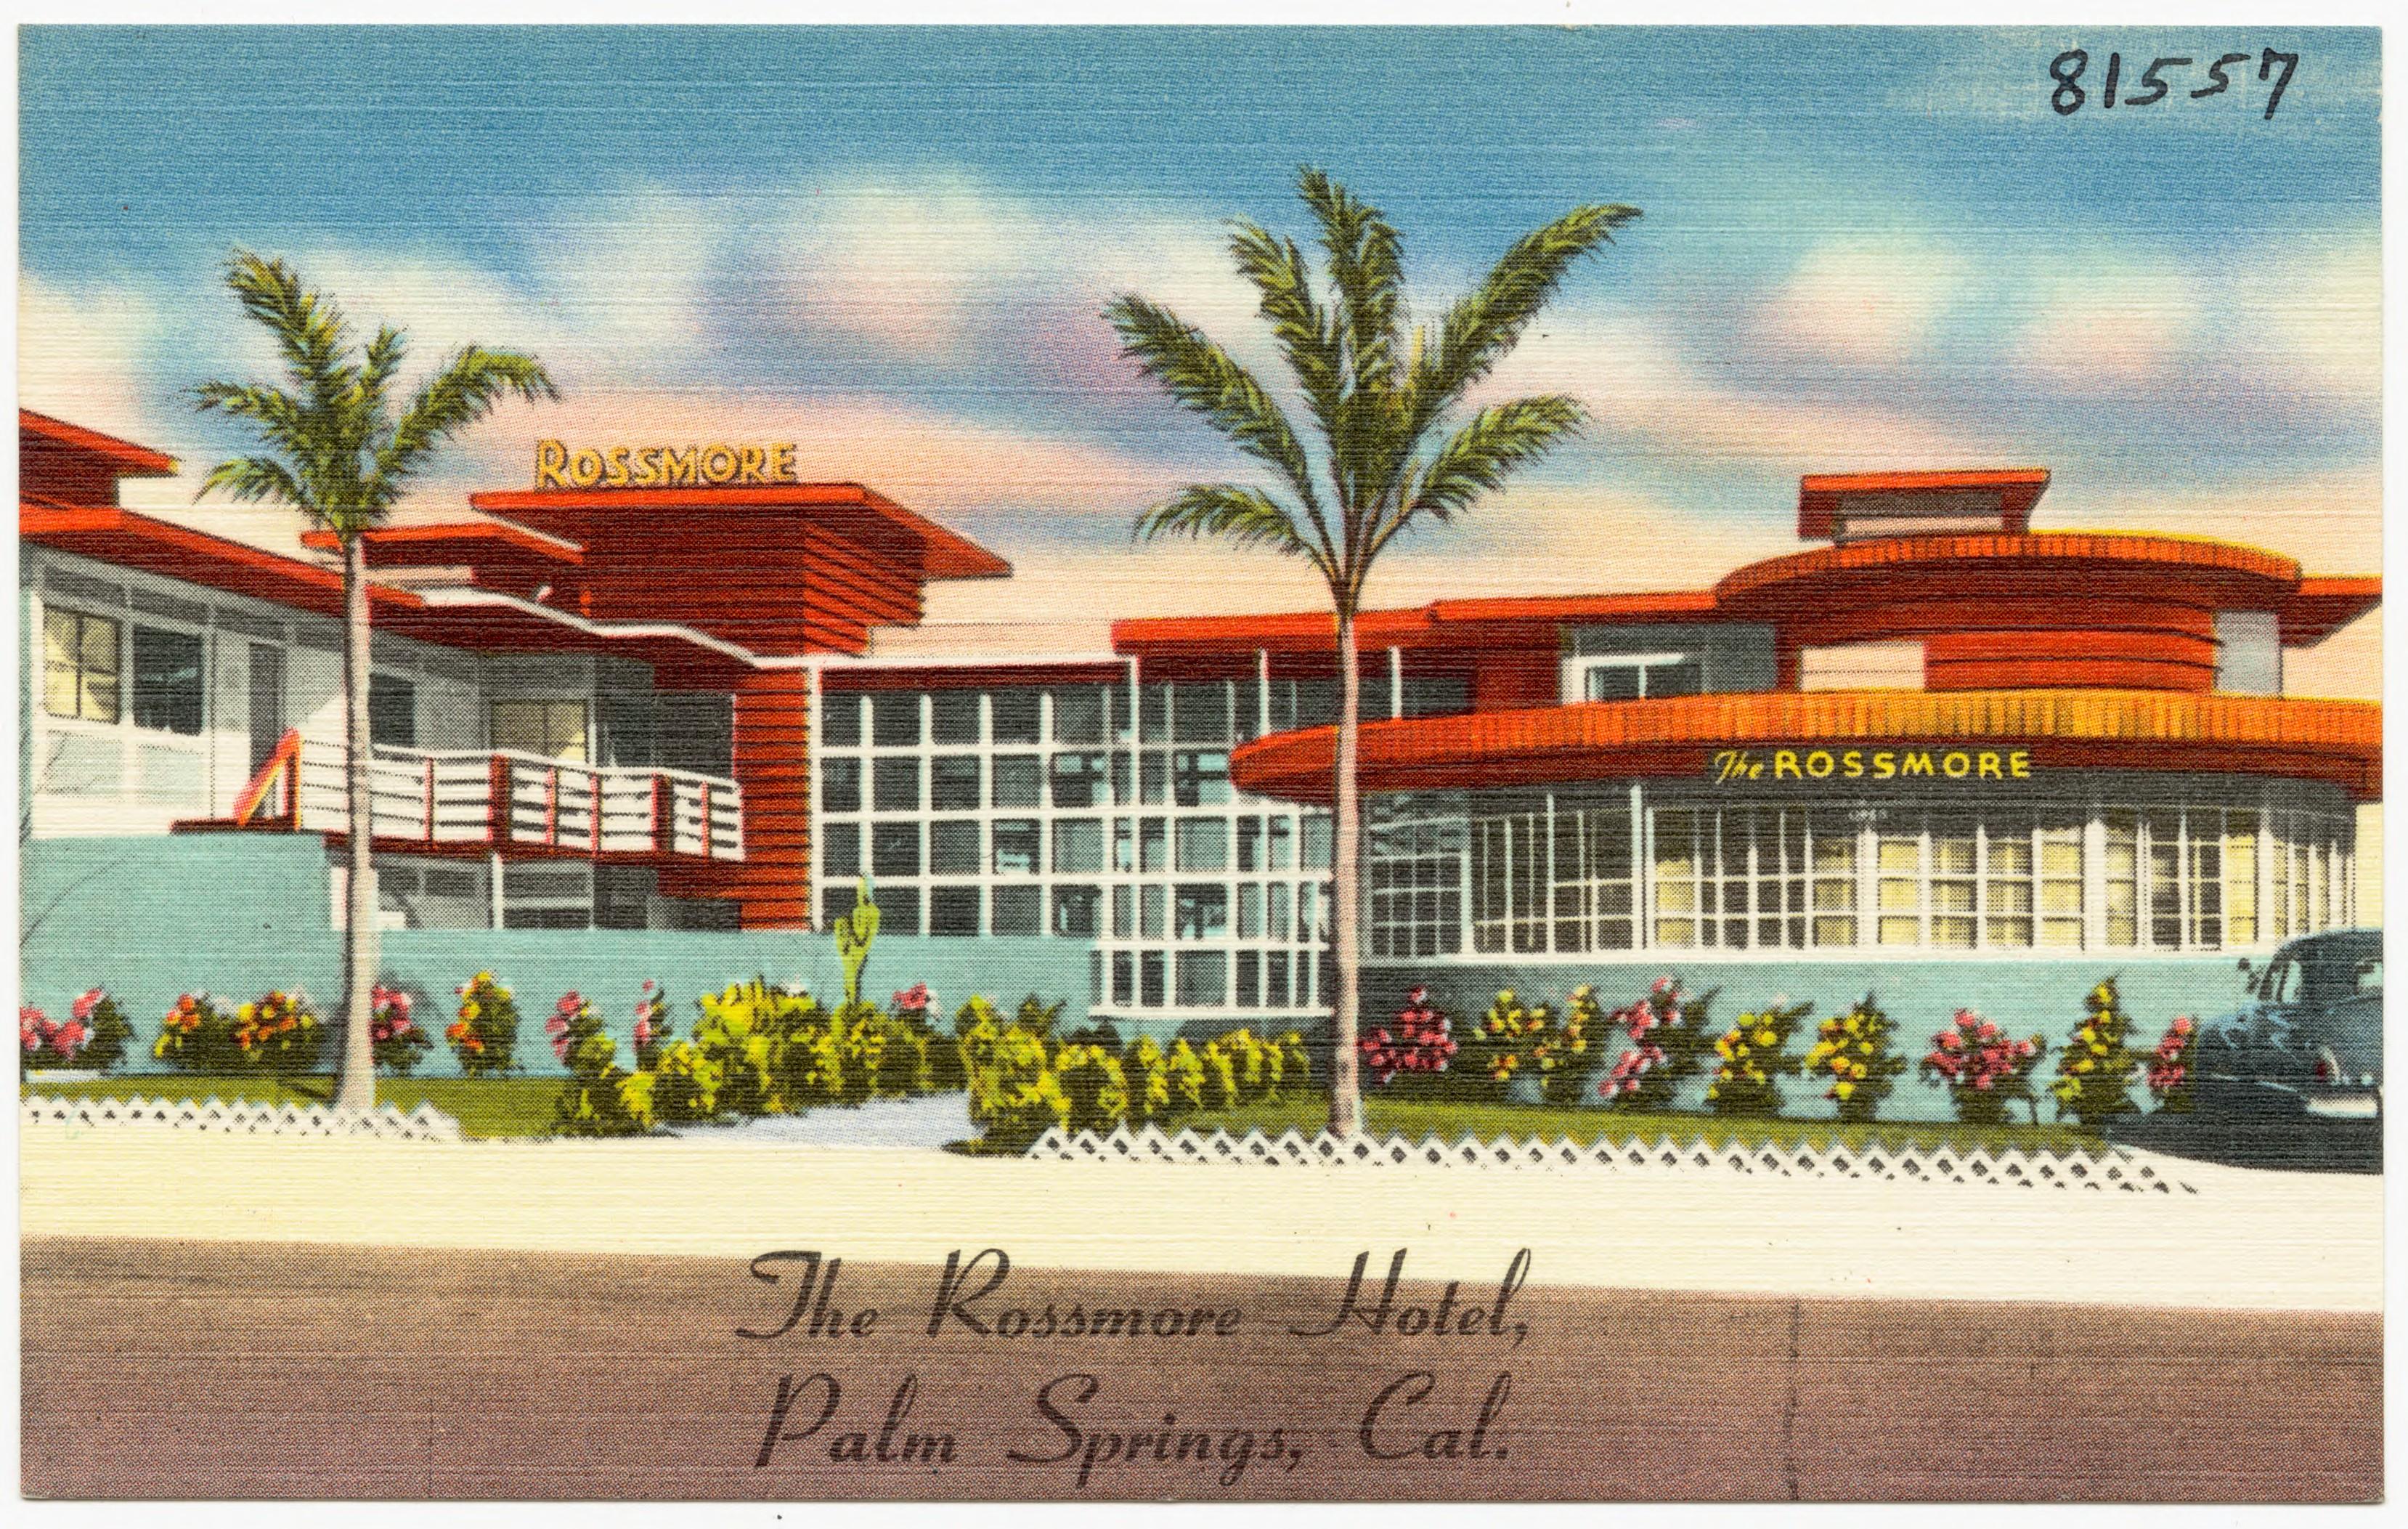 File The Rossmore Hotel Palm Springs Cal 81557 Jpg